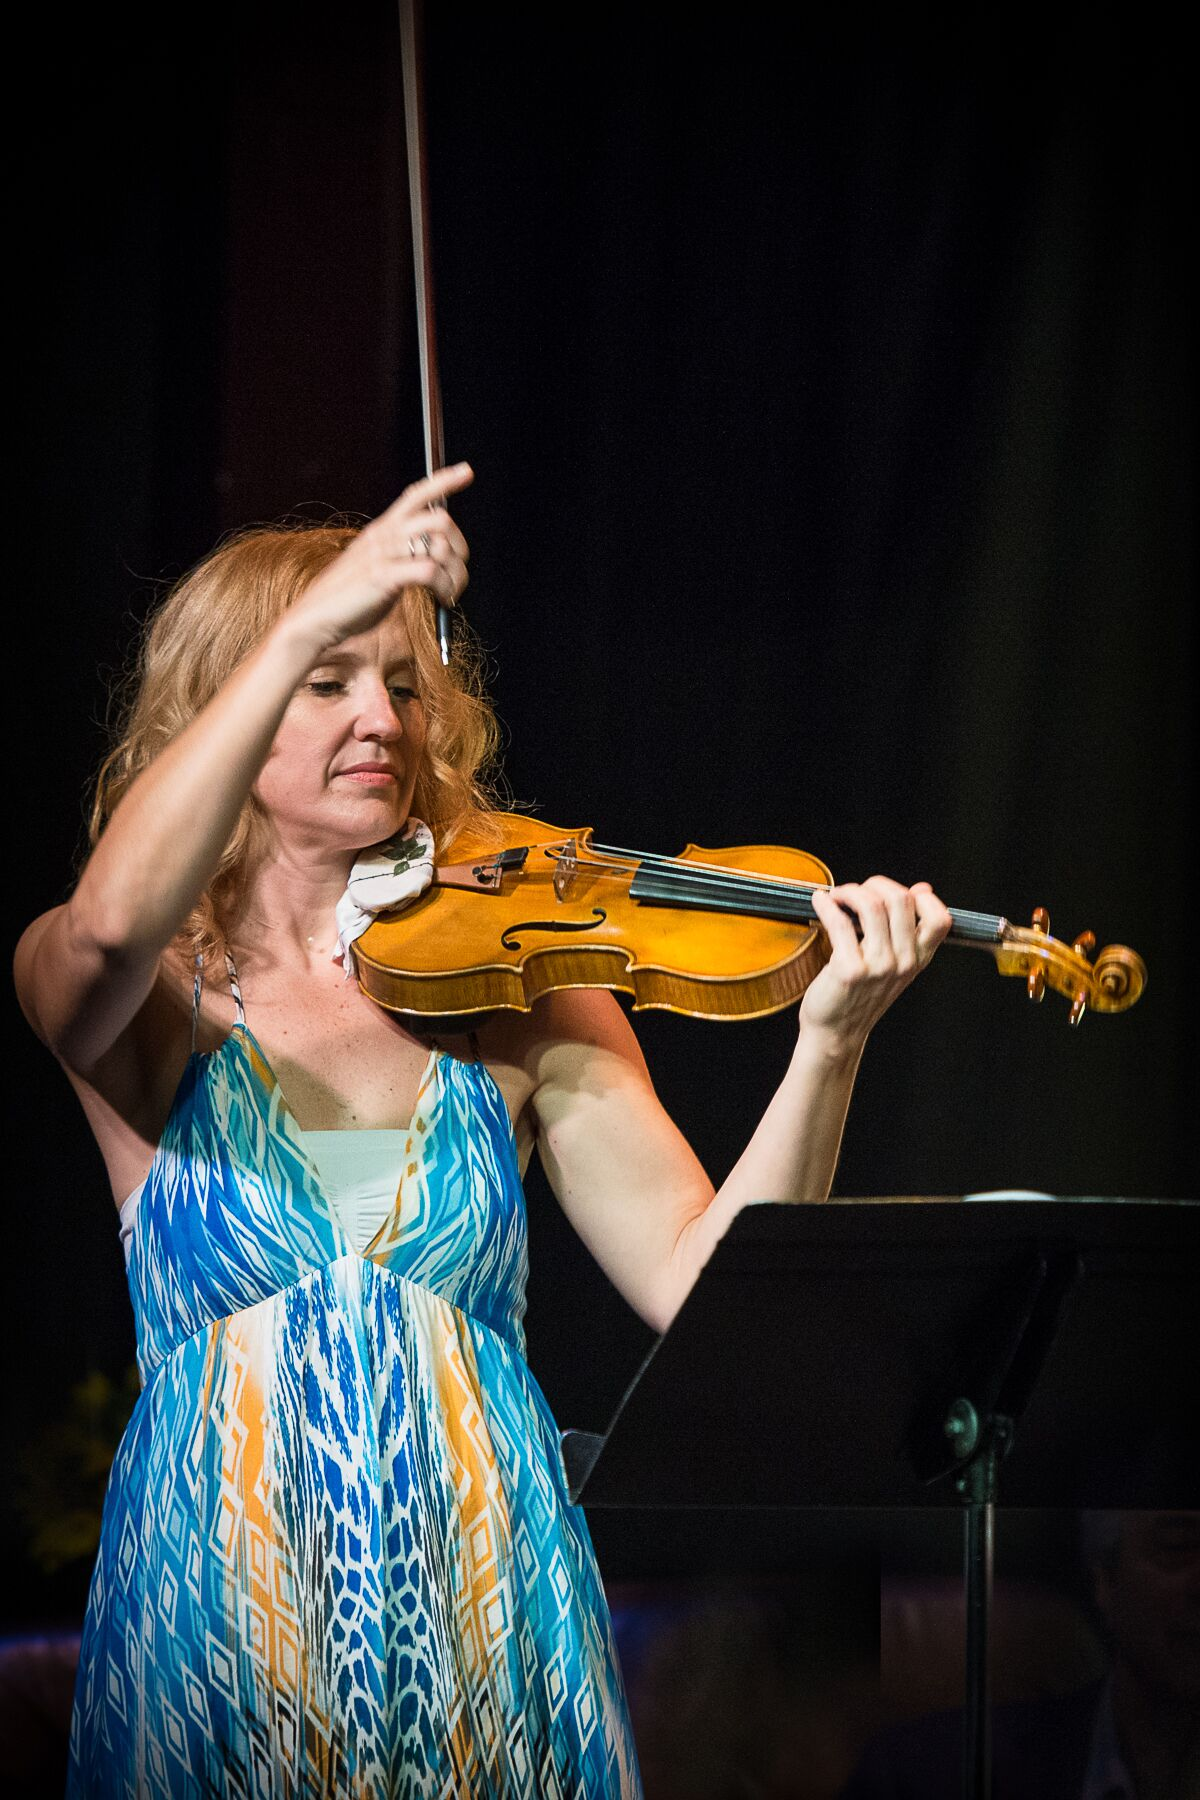 Denise Dillenbeck